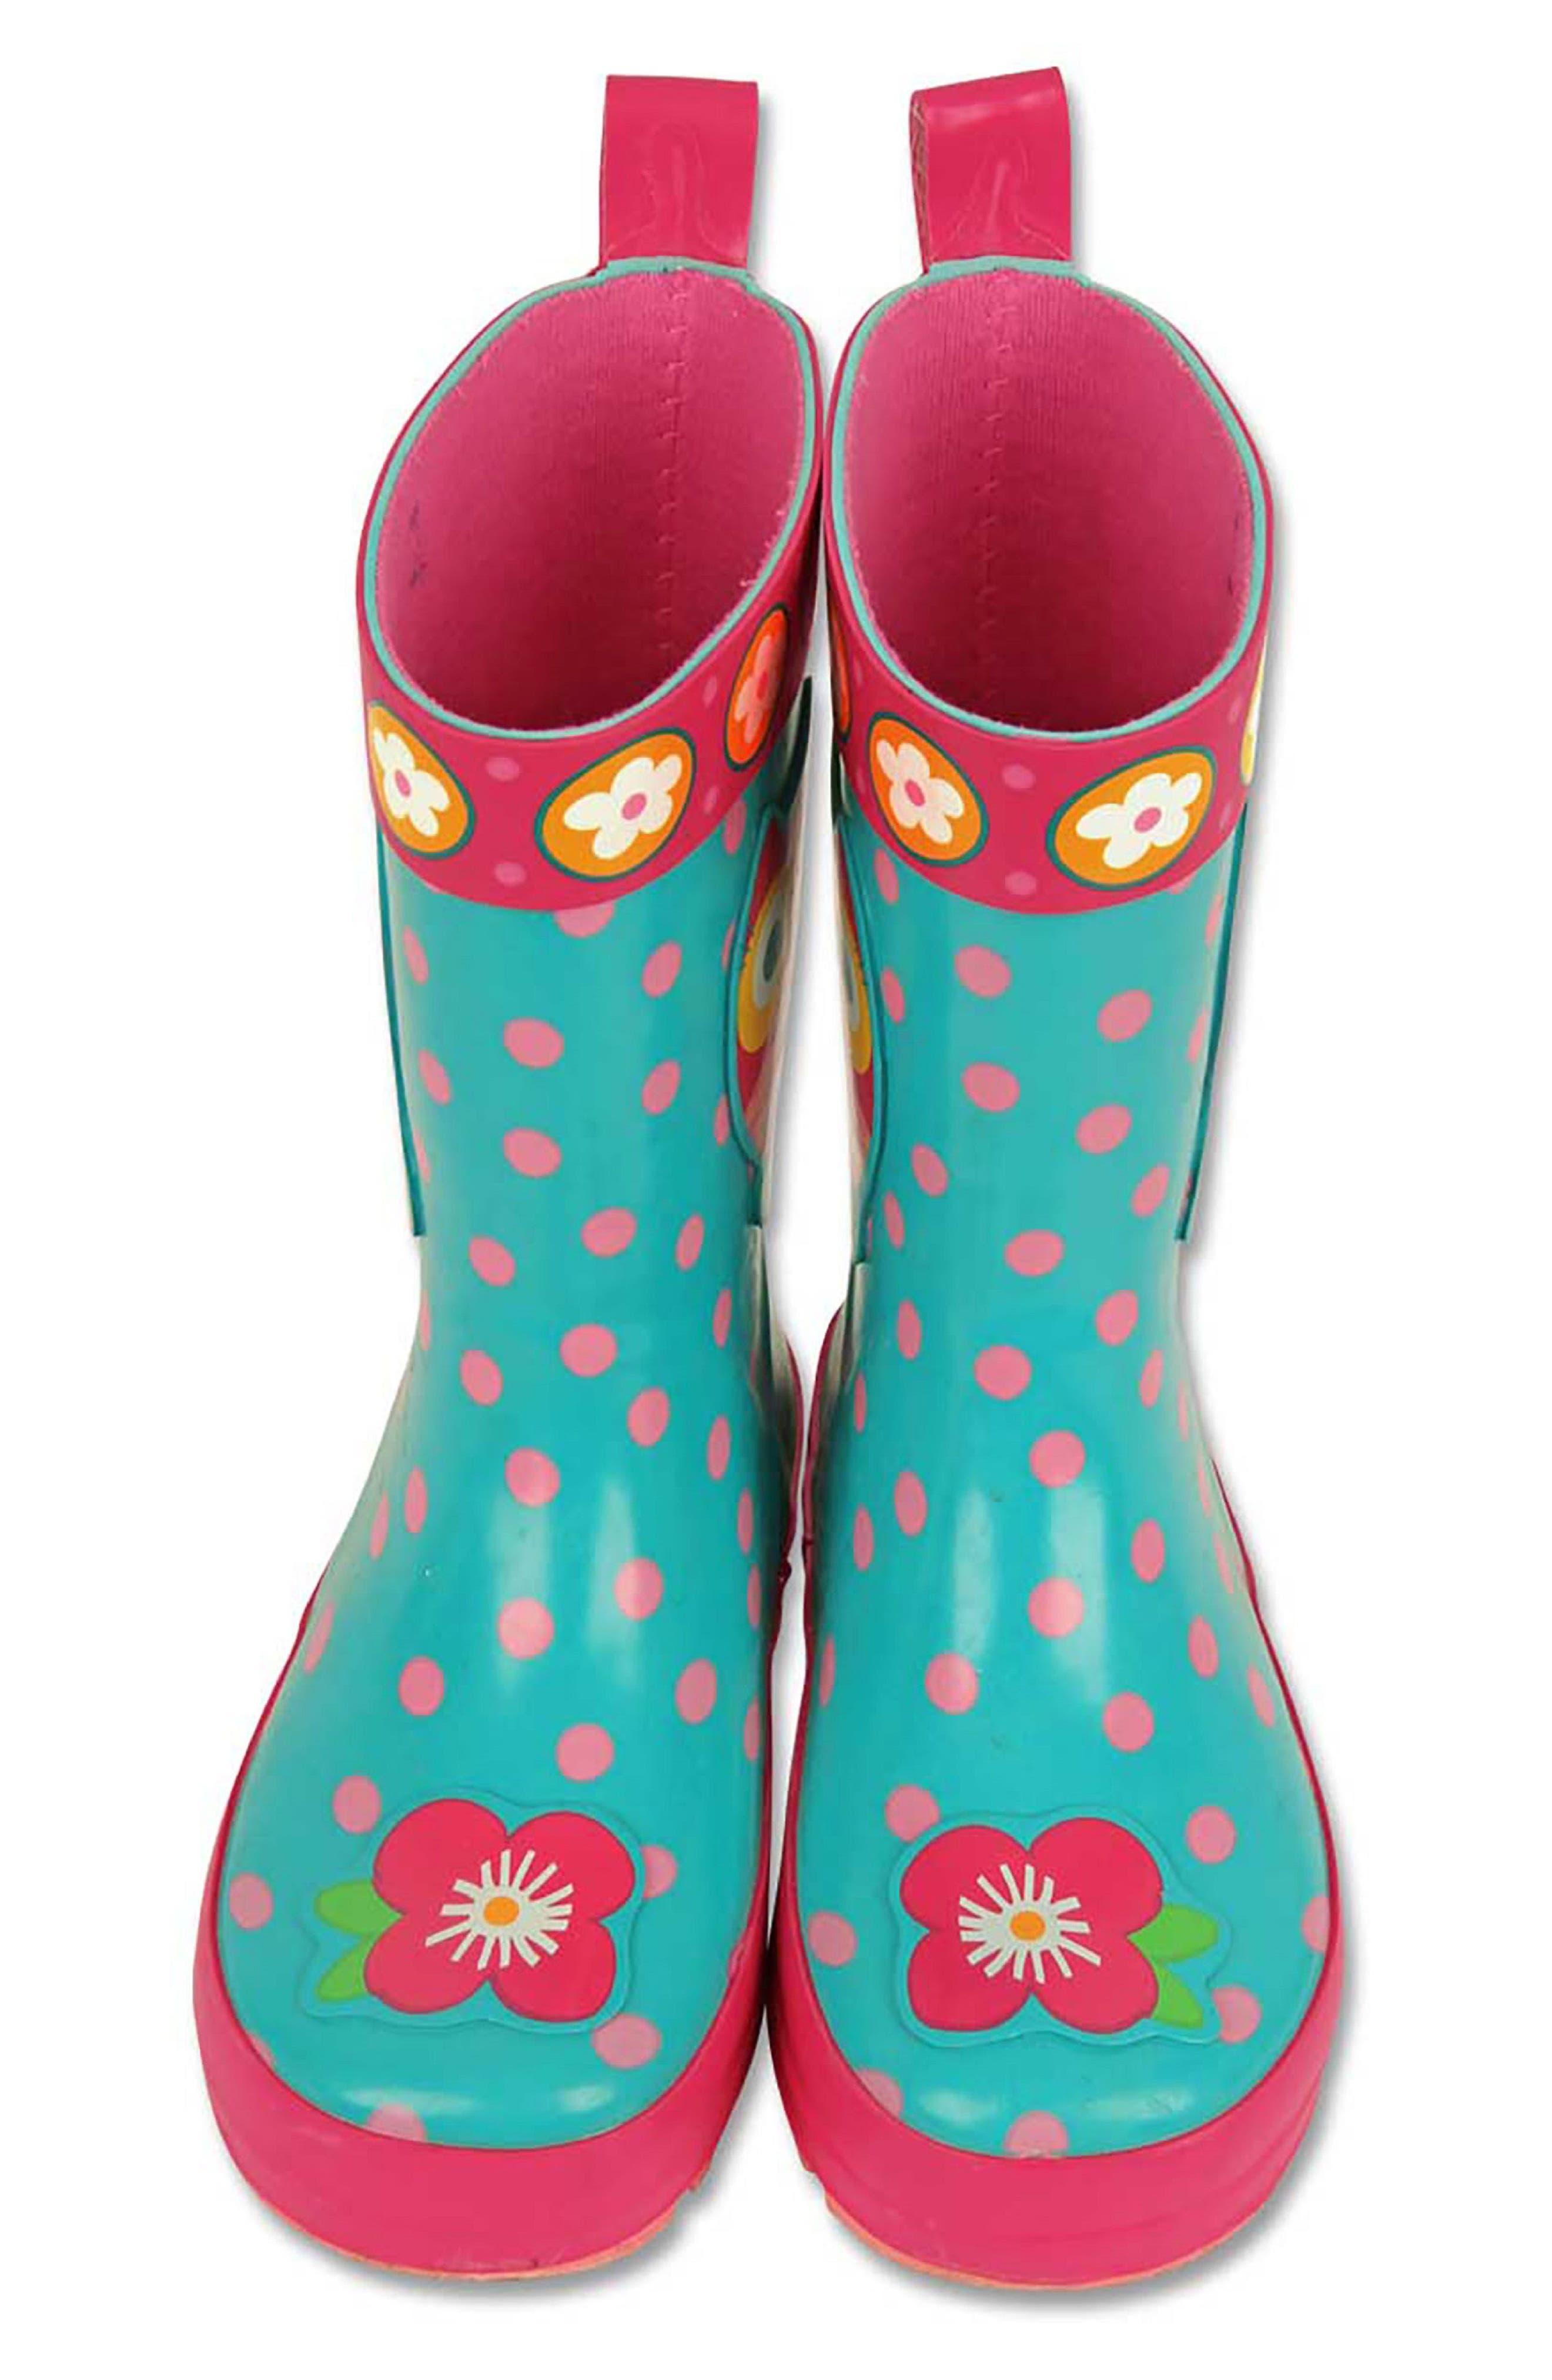 Owl Rain Boots & Umbrella Set,                             Alternate thumbnail 3, color,                             Owl